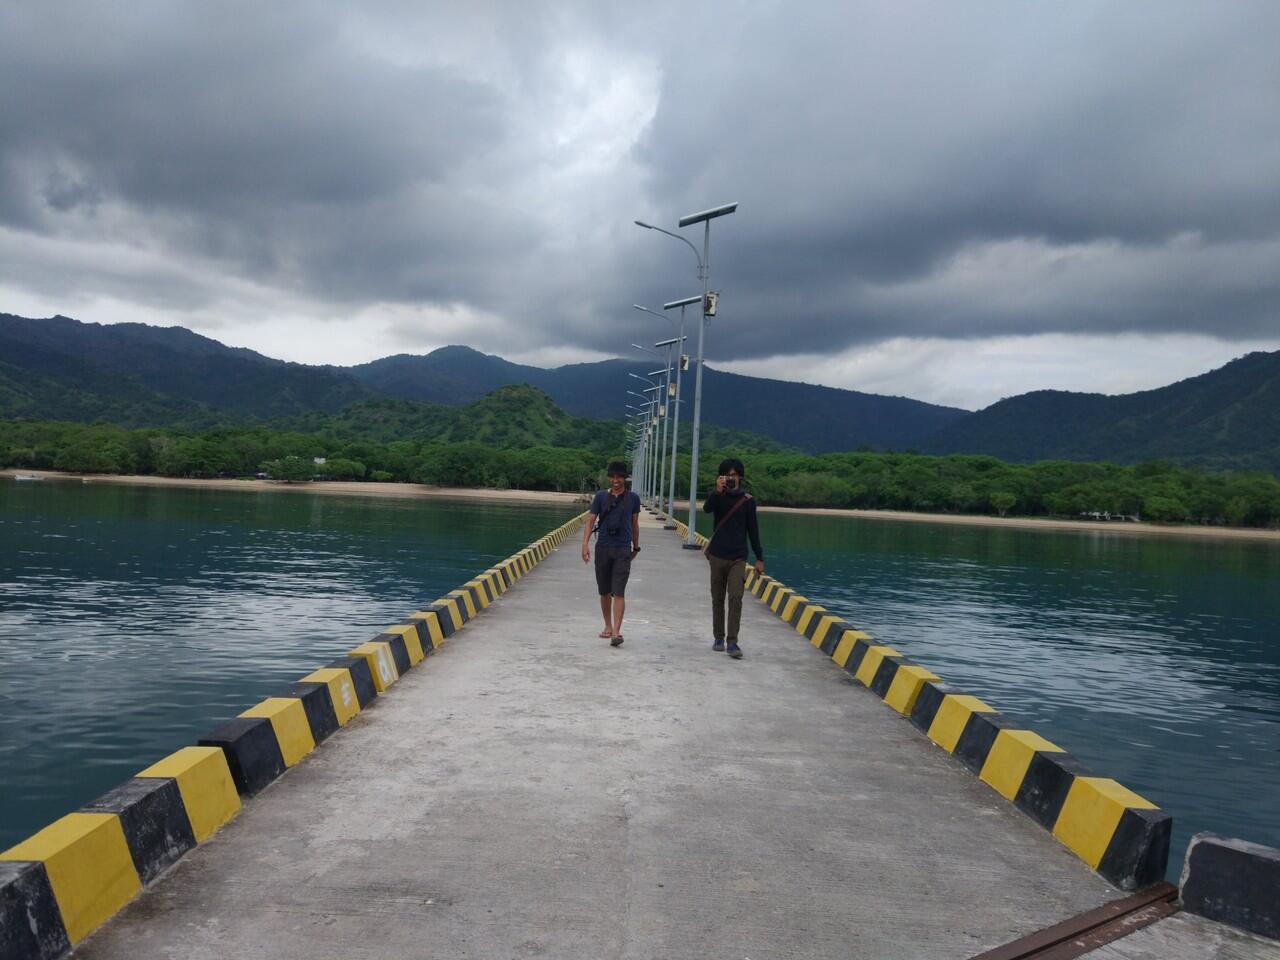 [CATPER] Long Trip Bali - Komodo - Nusa Penida - Jakarta Januari 2017